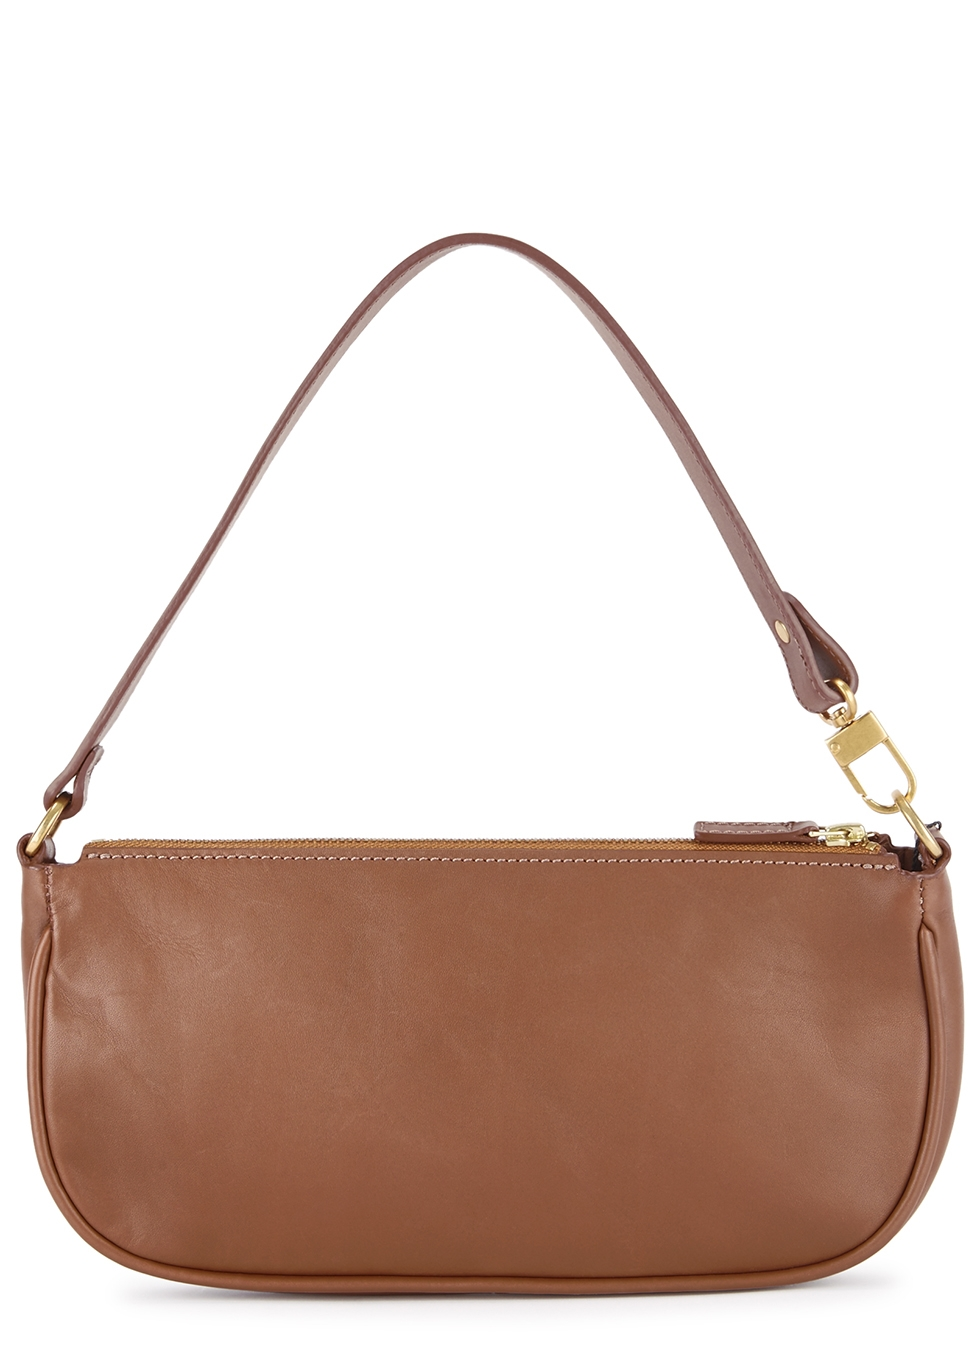 Rachel brown leather top handle bag - BY FAR